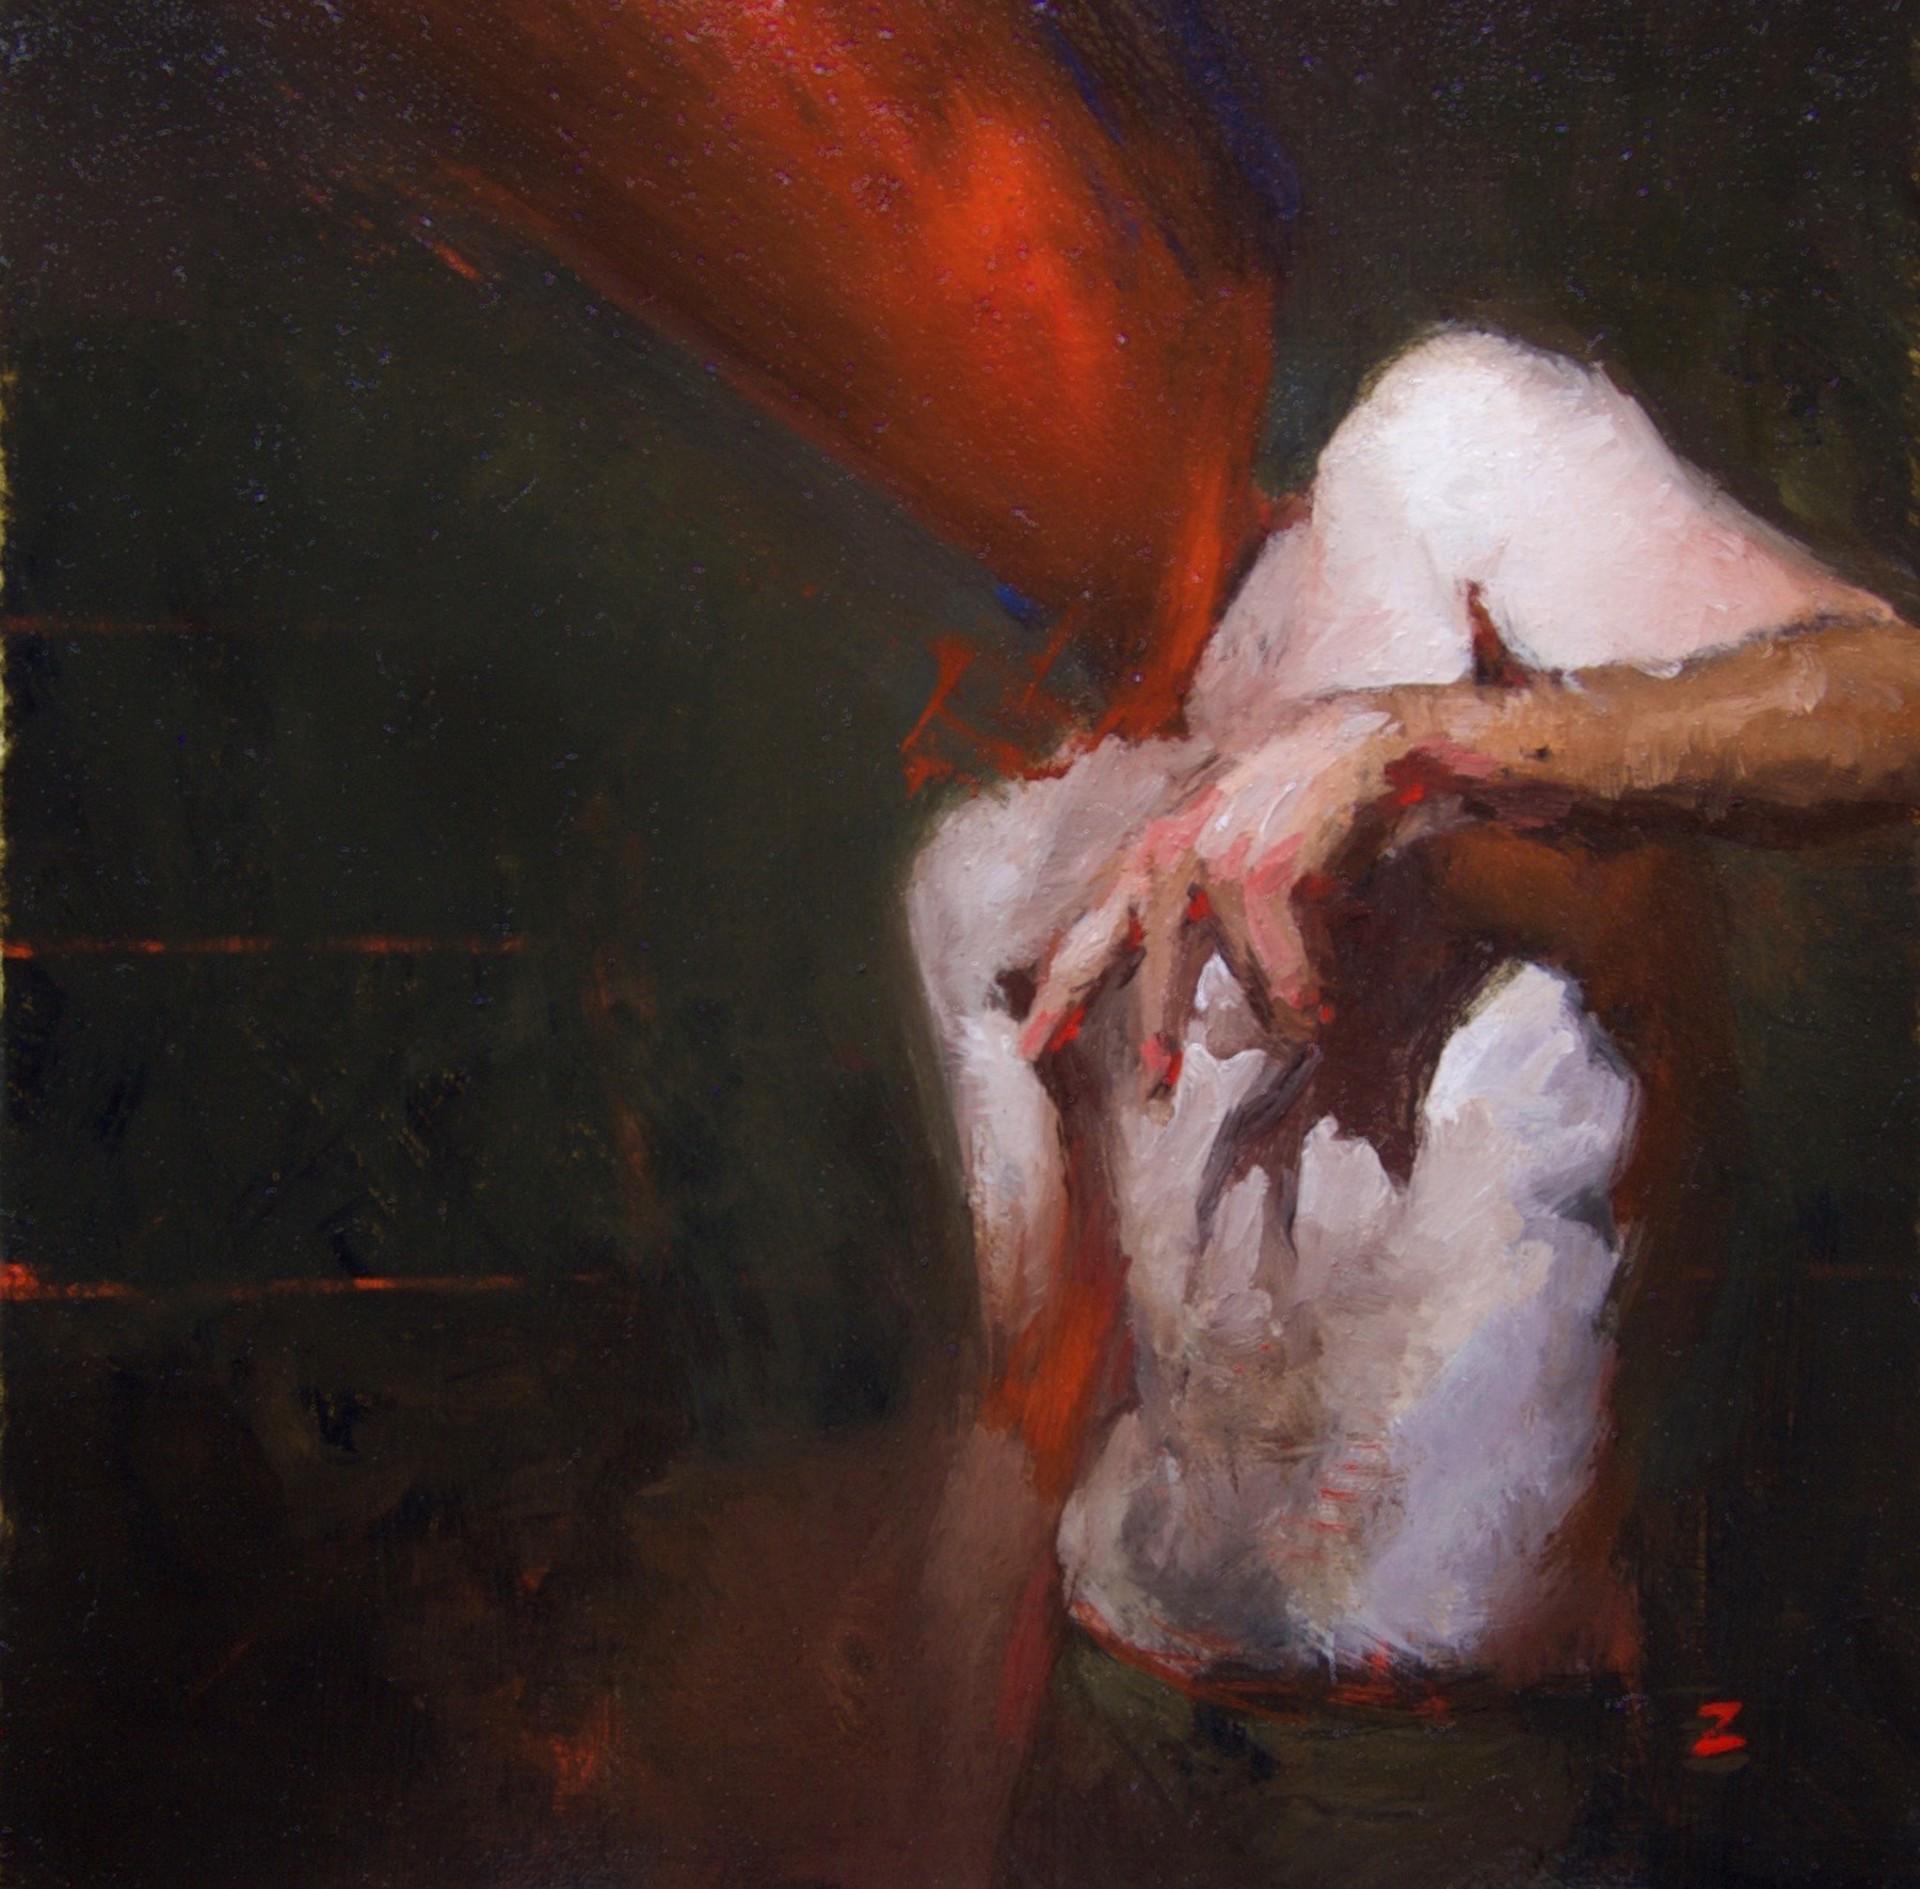 Flinch by Zack Zdrale